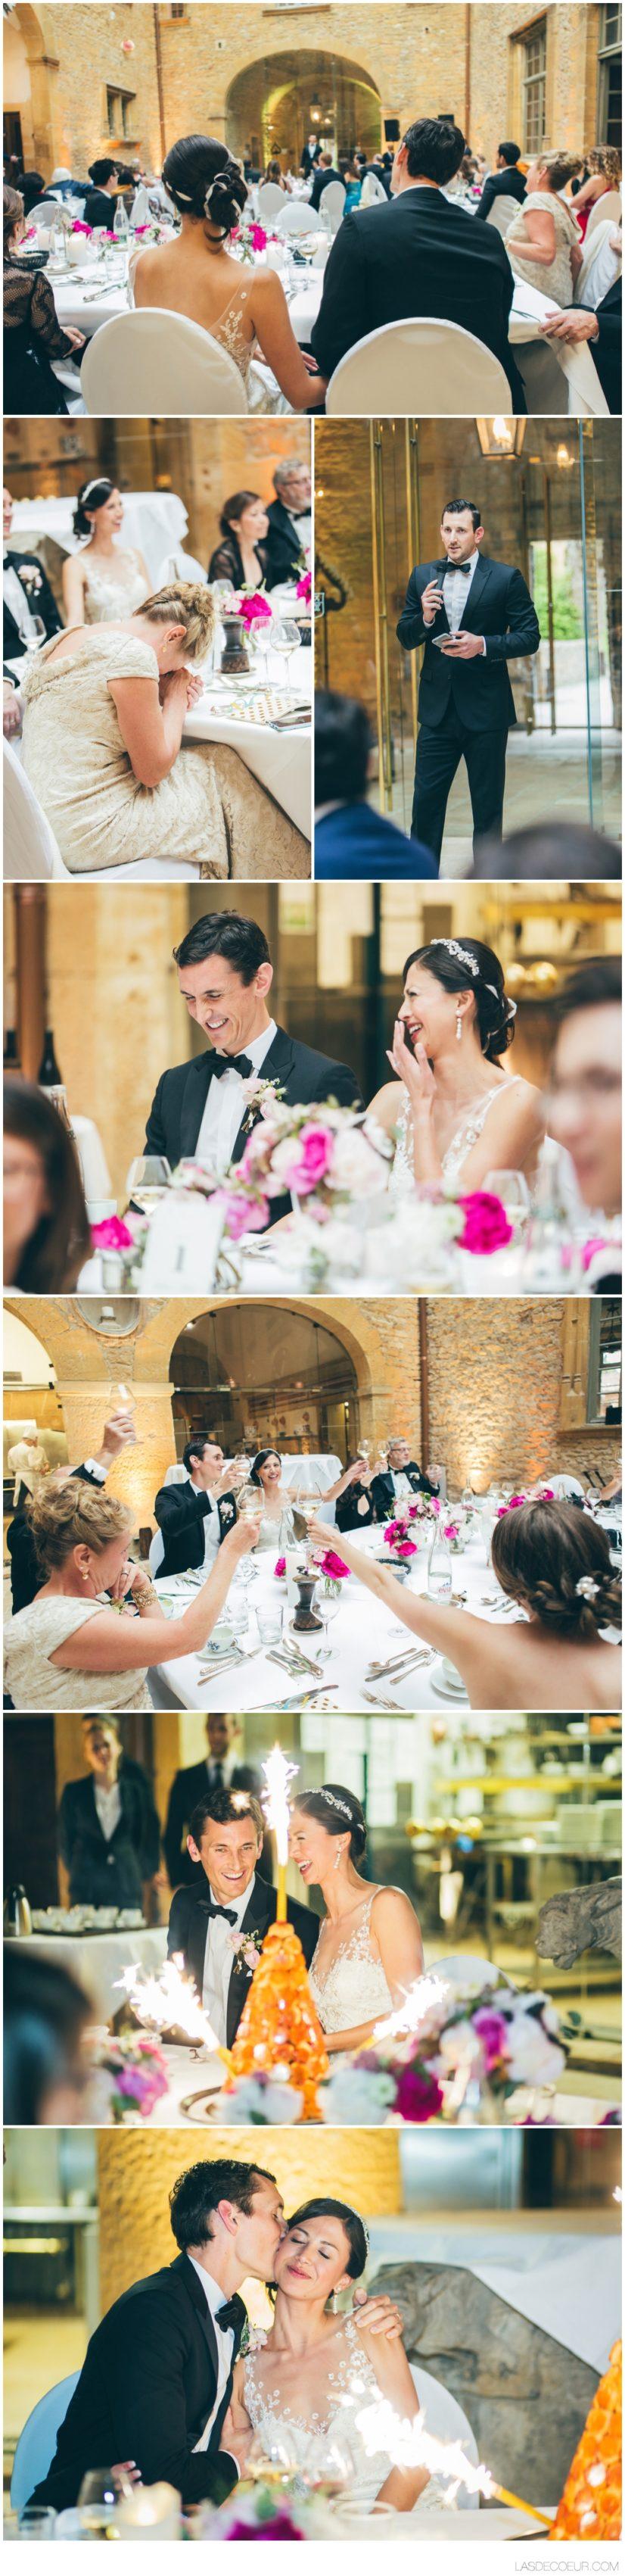 Photo discours mariage Chateau Bagnols Lyon ©lasdecoeur